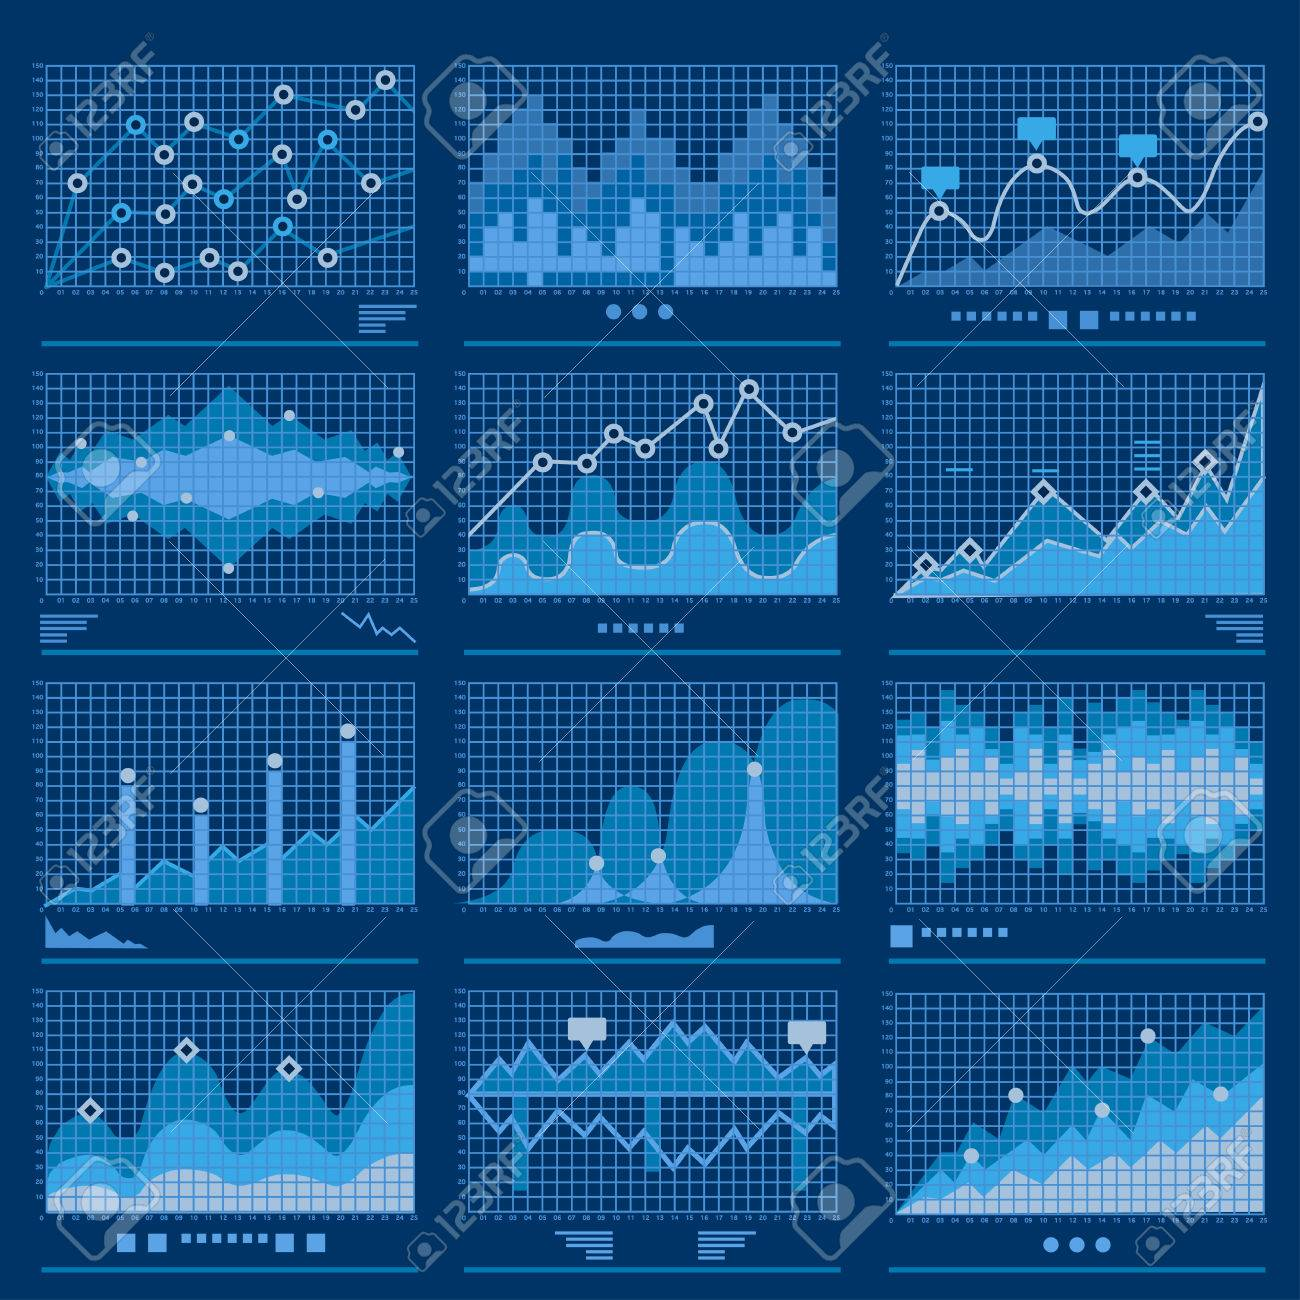 Big datos blueprint anlisis de datos azul de fondo ilustracin big datos blueprint anlisis de datos azul de fondo ilustracin vectorial foto de archivo 82753860 malvernweather Choice Image